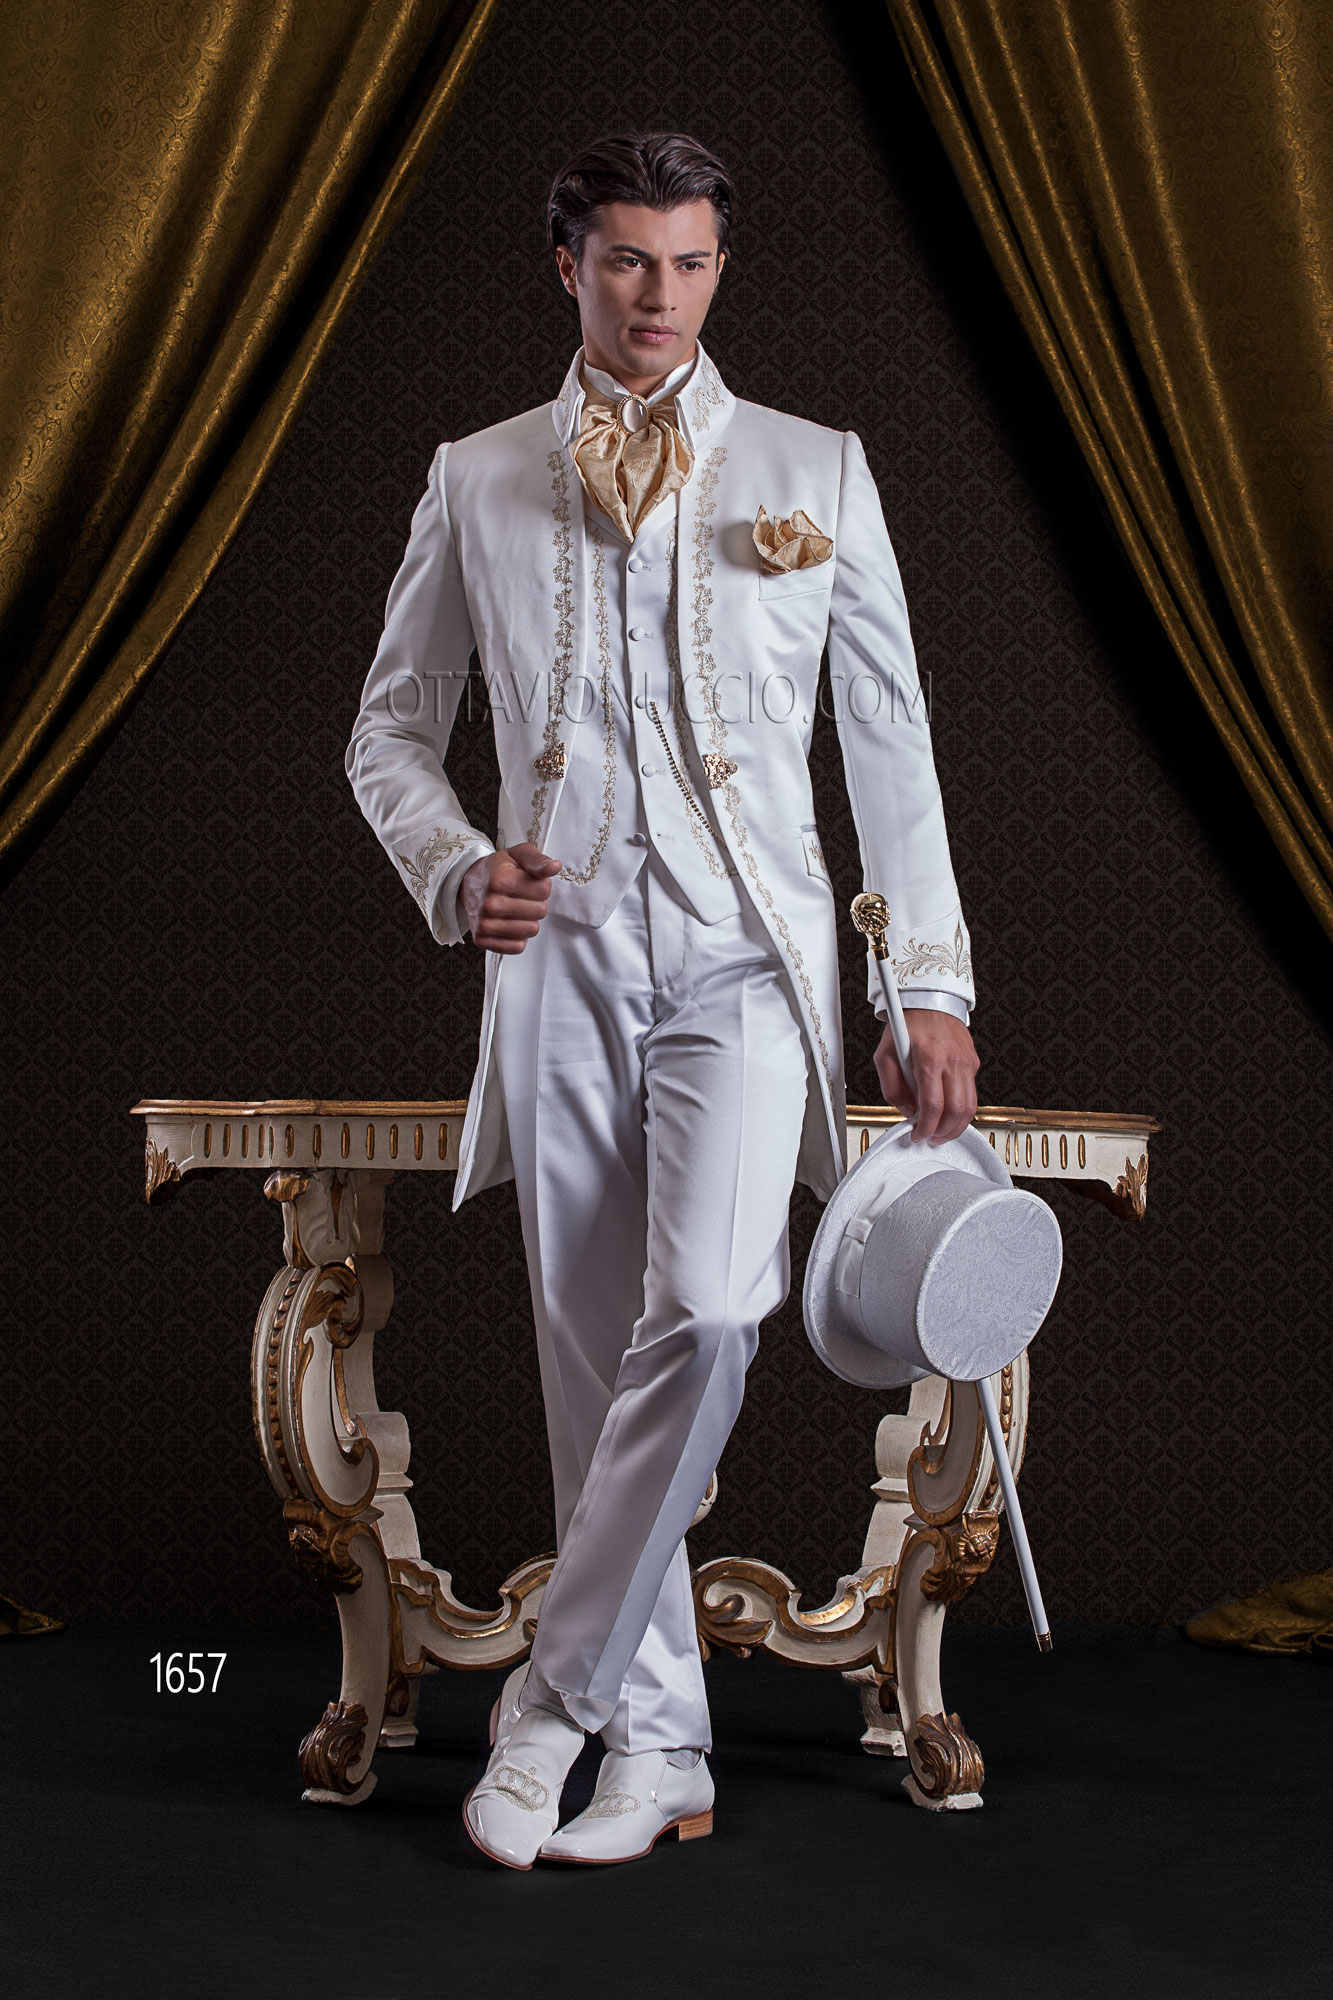 costume mariage baroque pour homme en satin blanc brod e or. Black Bedroom Furniture Sets. Home Design Ideas